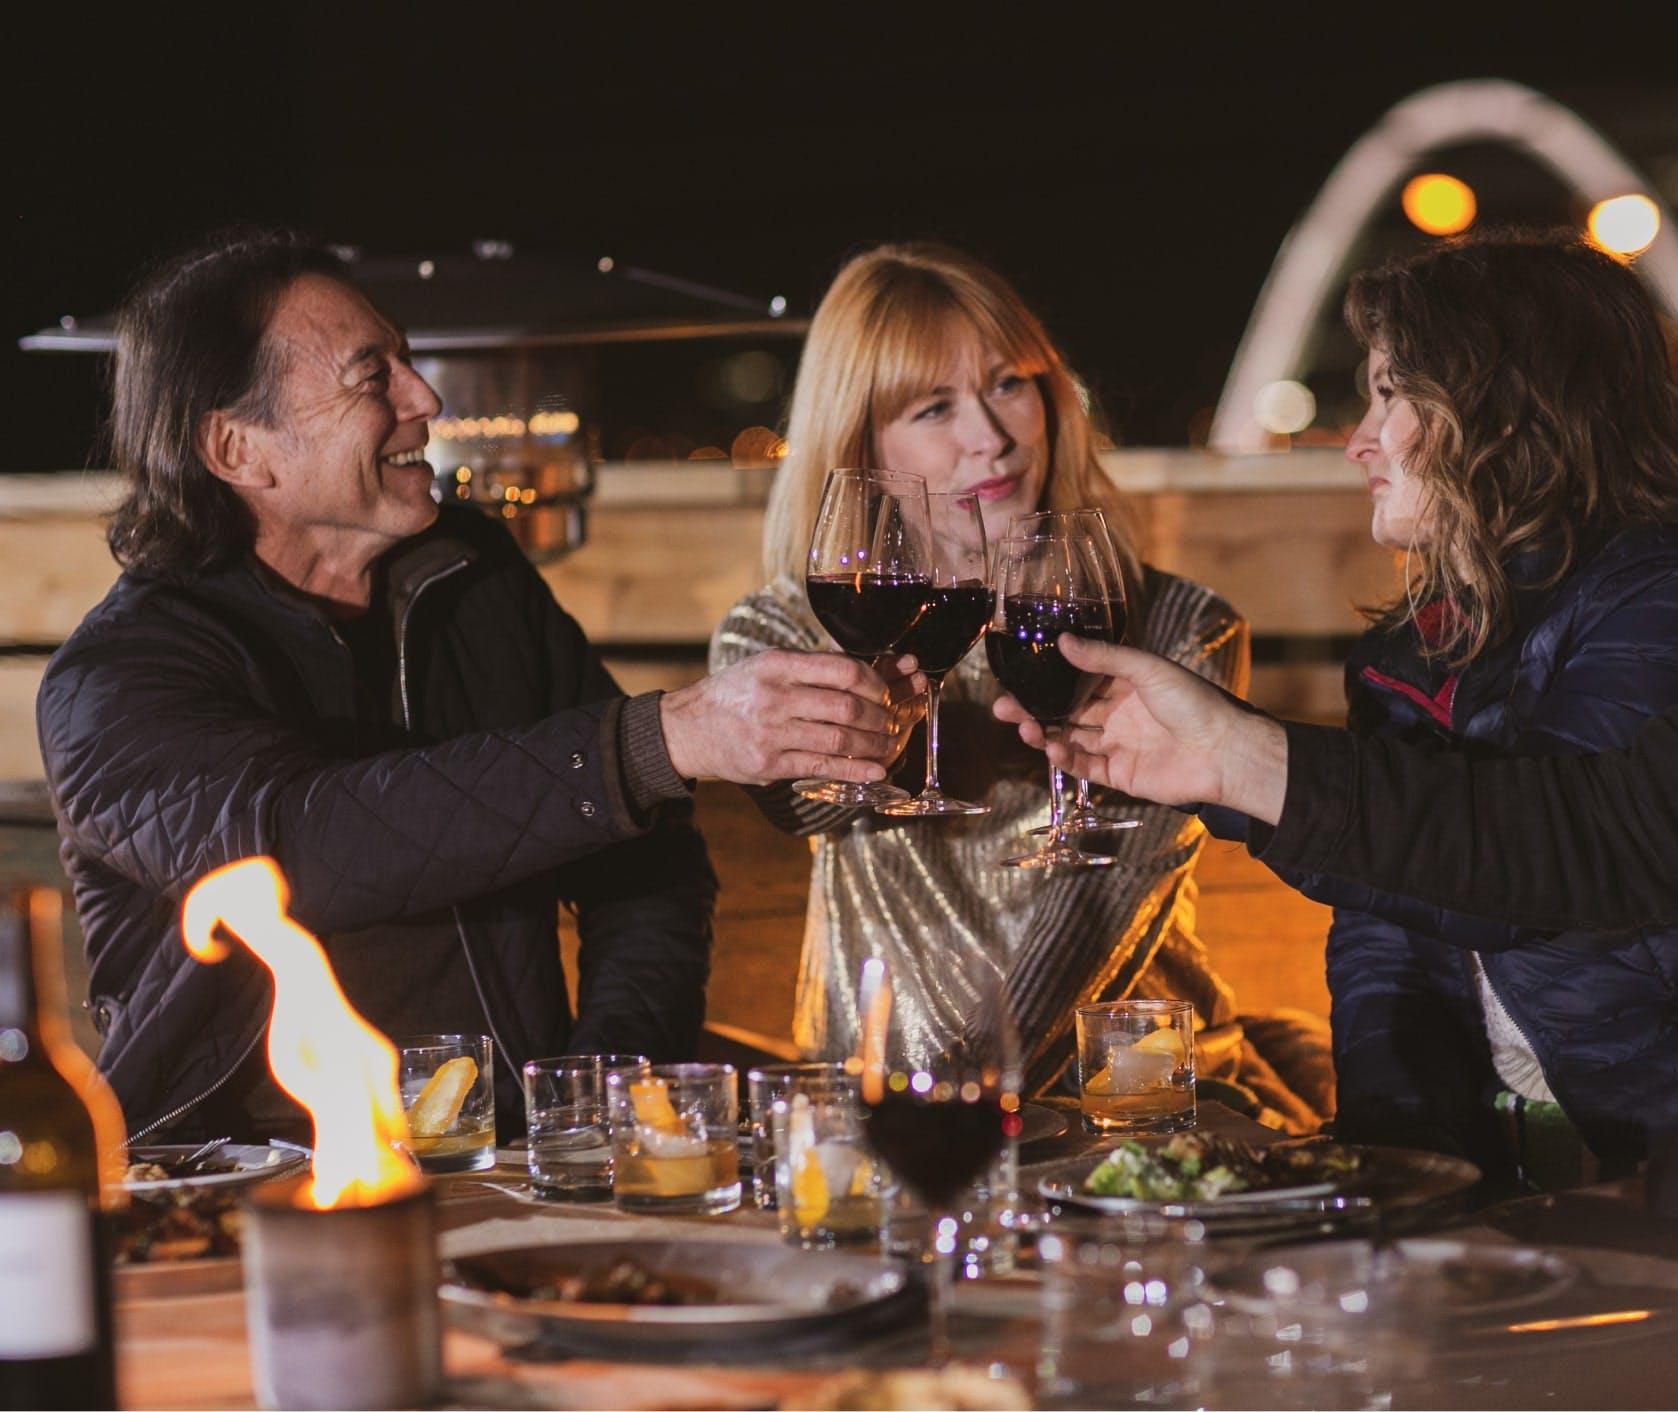 Three people clinking wine glasses.